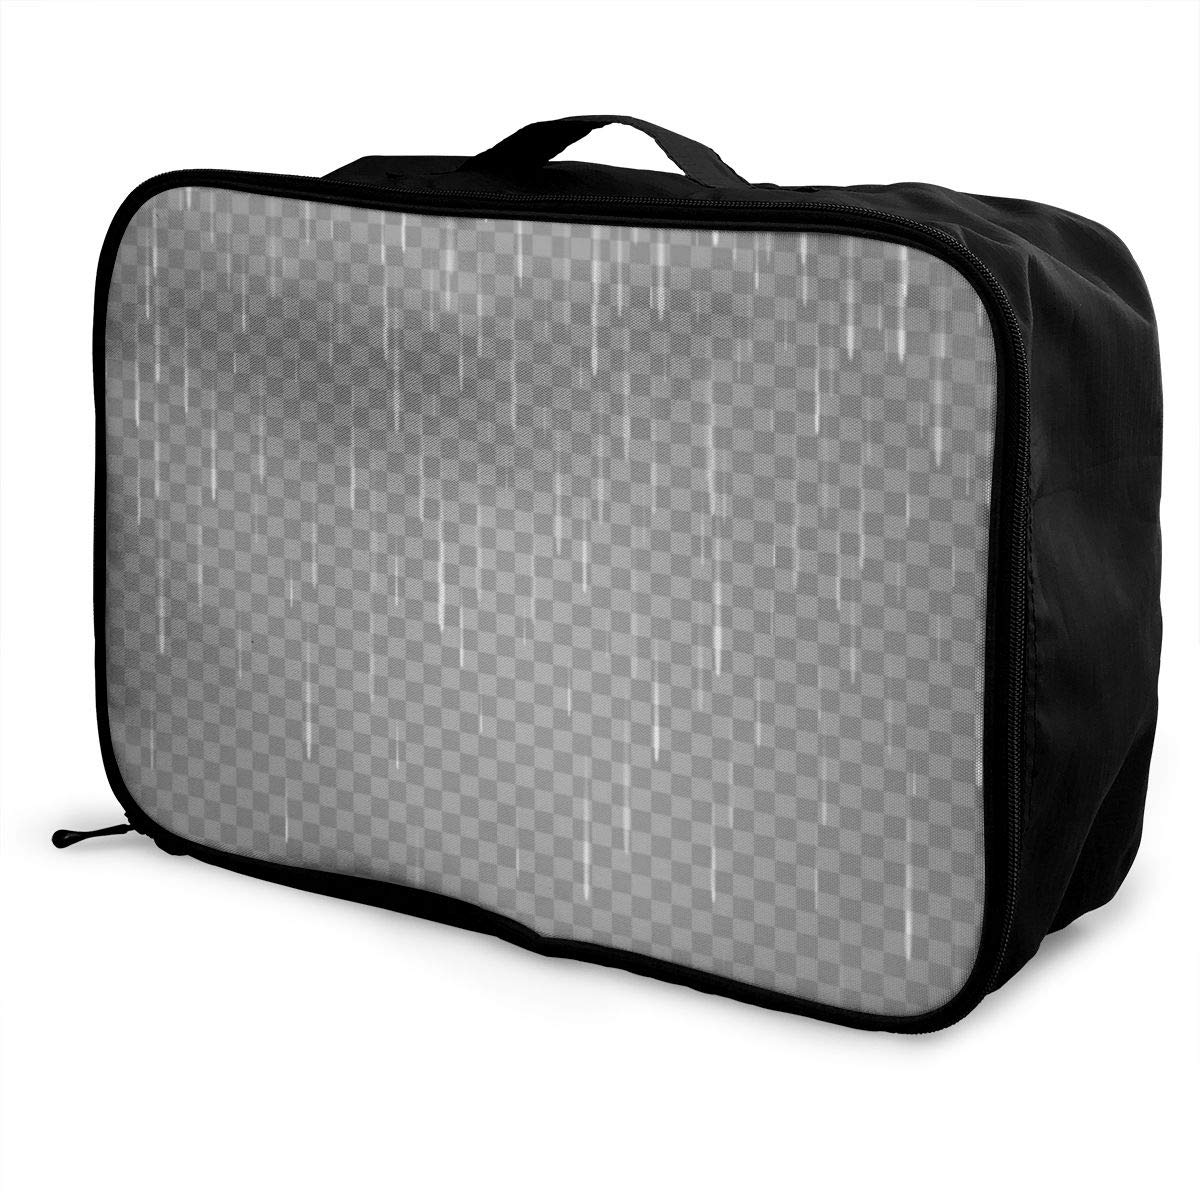 Yunshm Transparent Rain Image Rainy And Cloudy Personalized Trolley Handbag Waterproof Unisex Large Capacity For Business Travel Storage